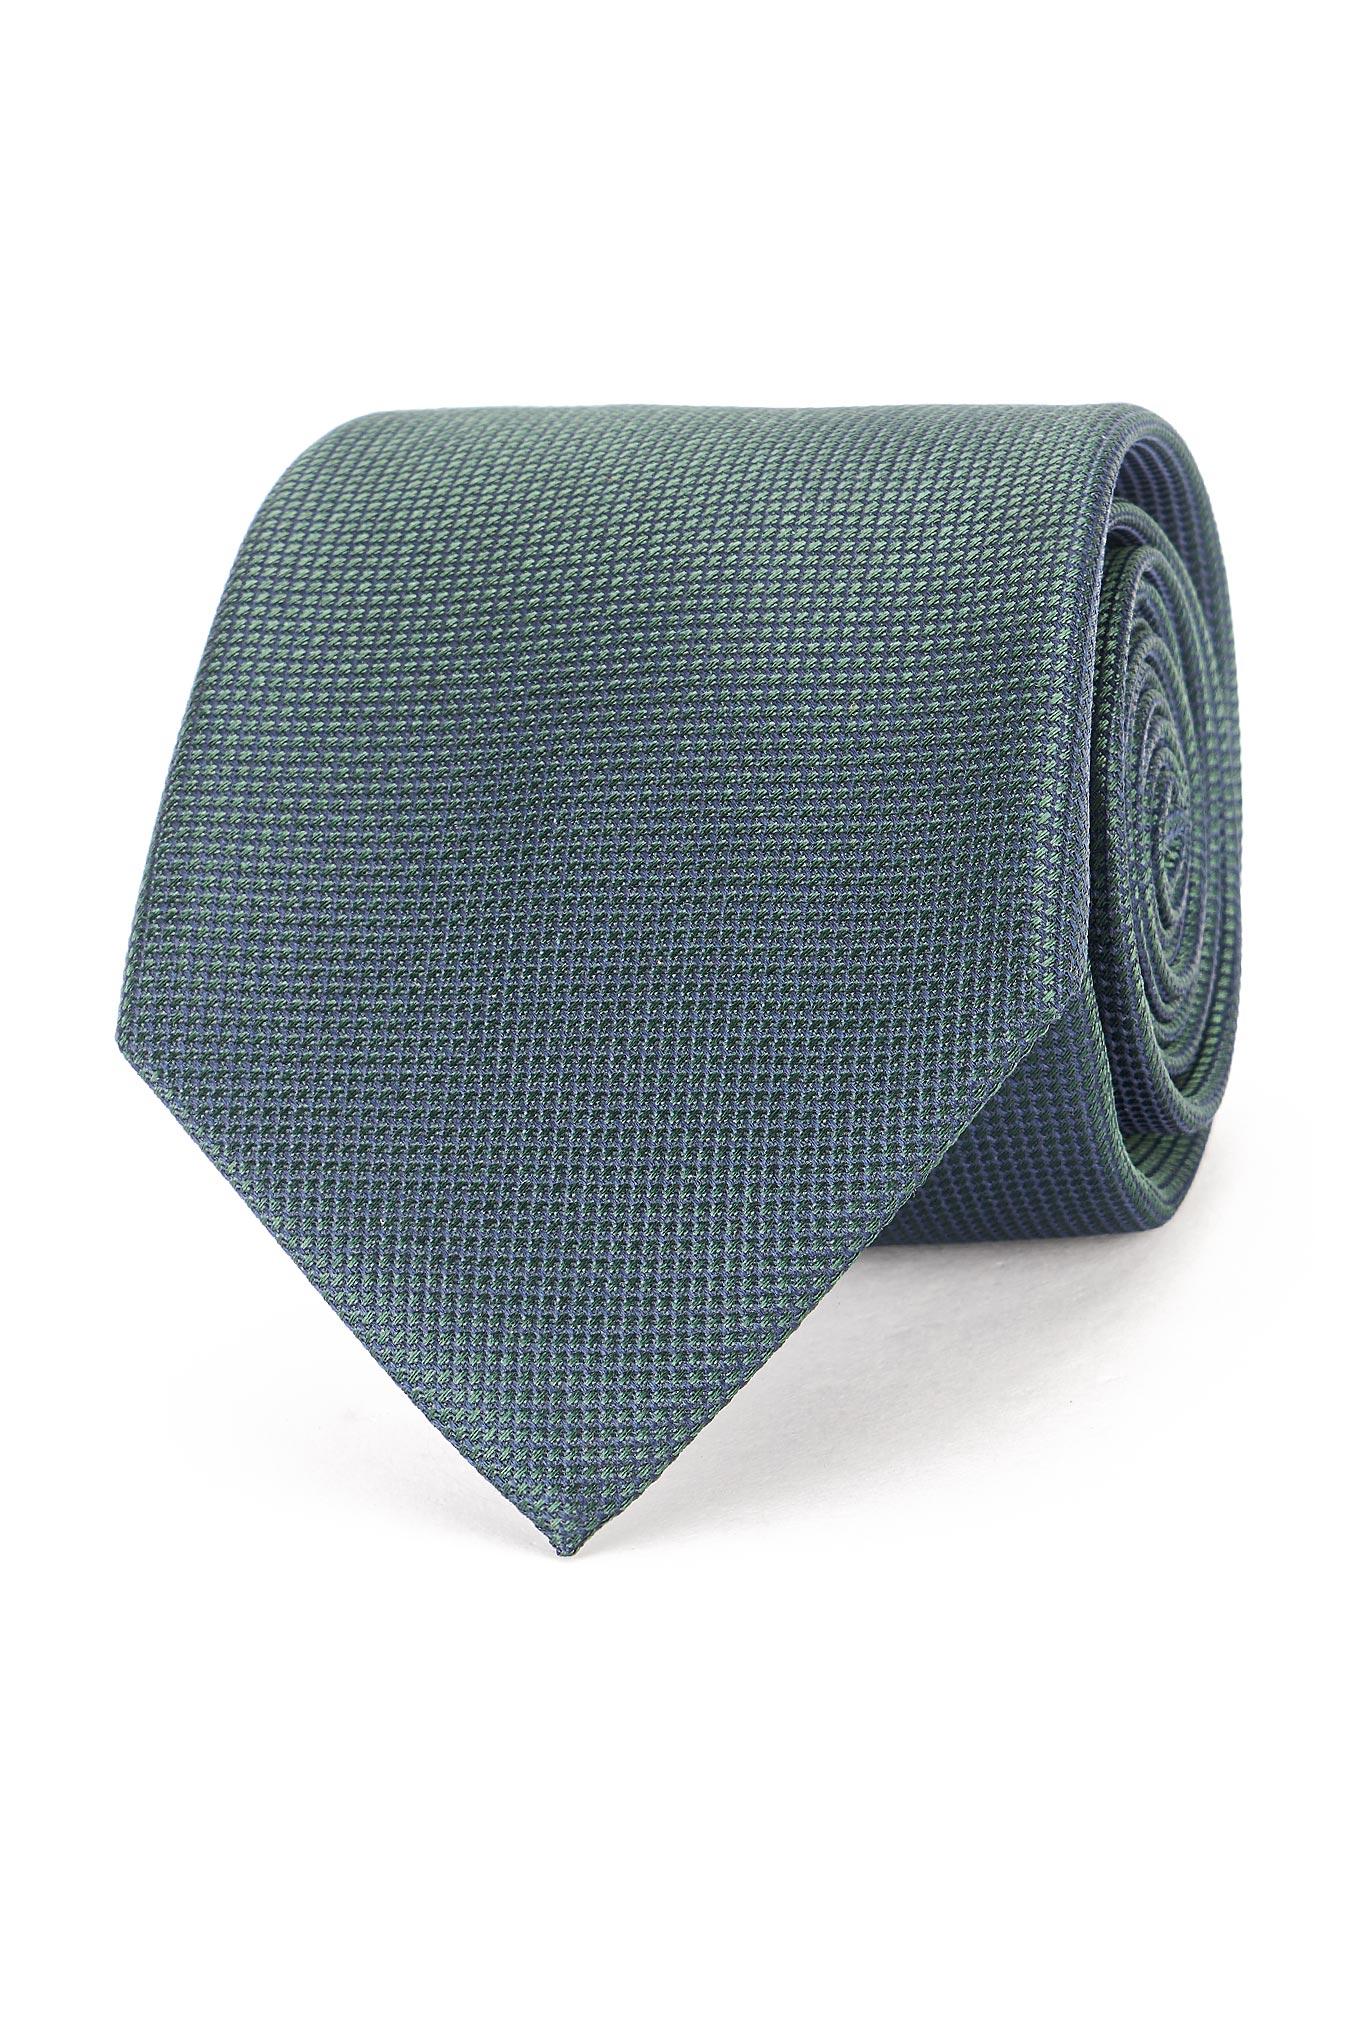 Gravata Verde Escuro Classic Homem